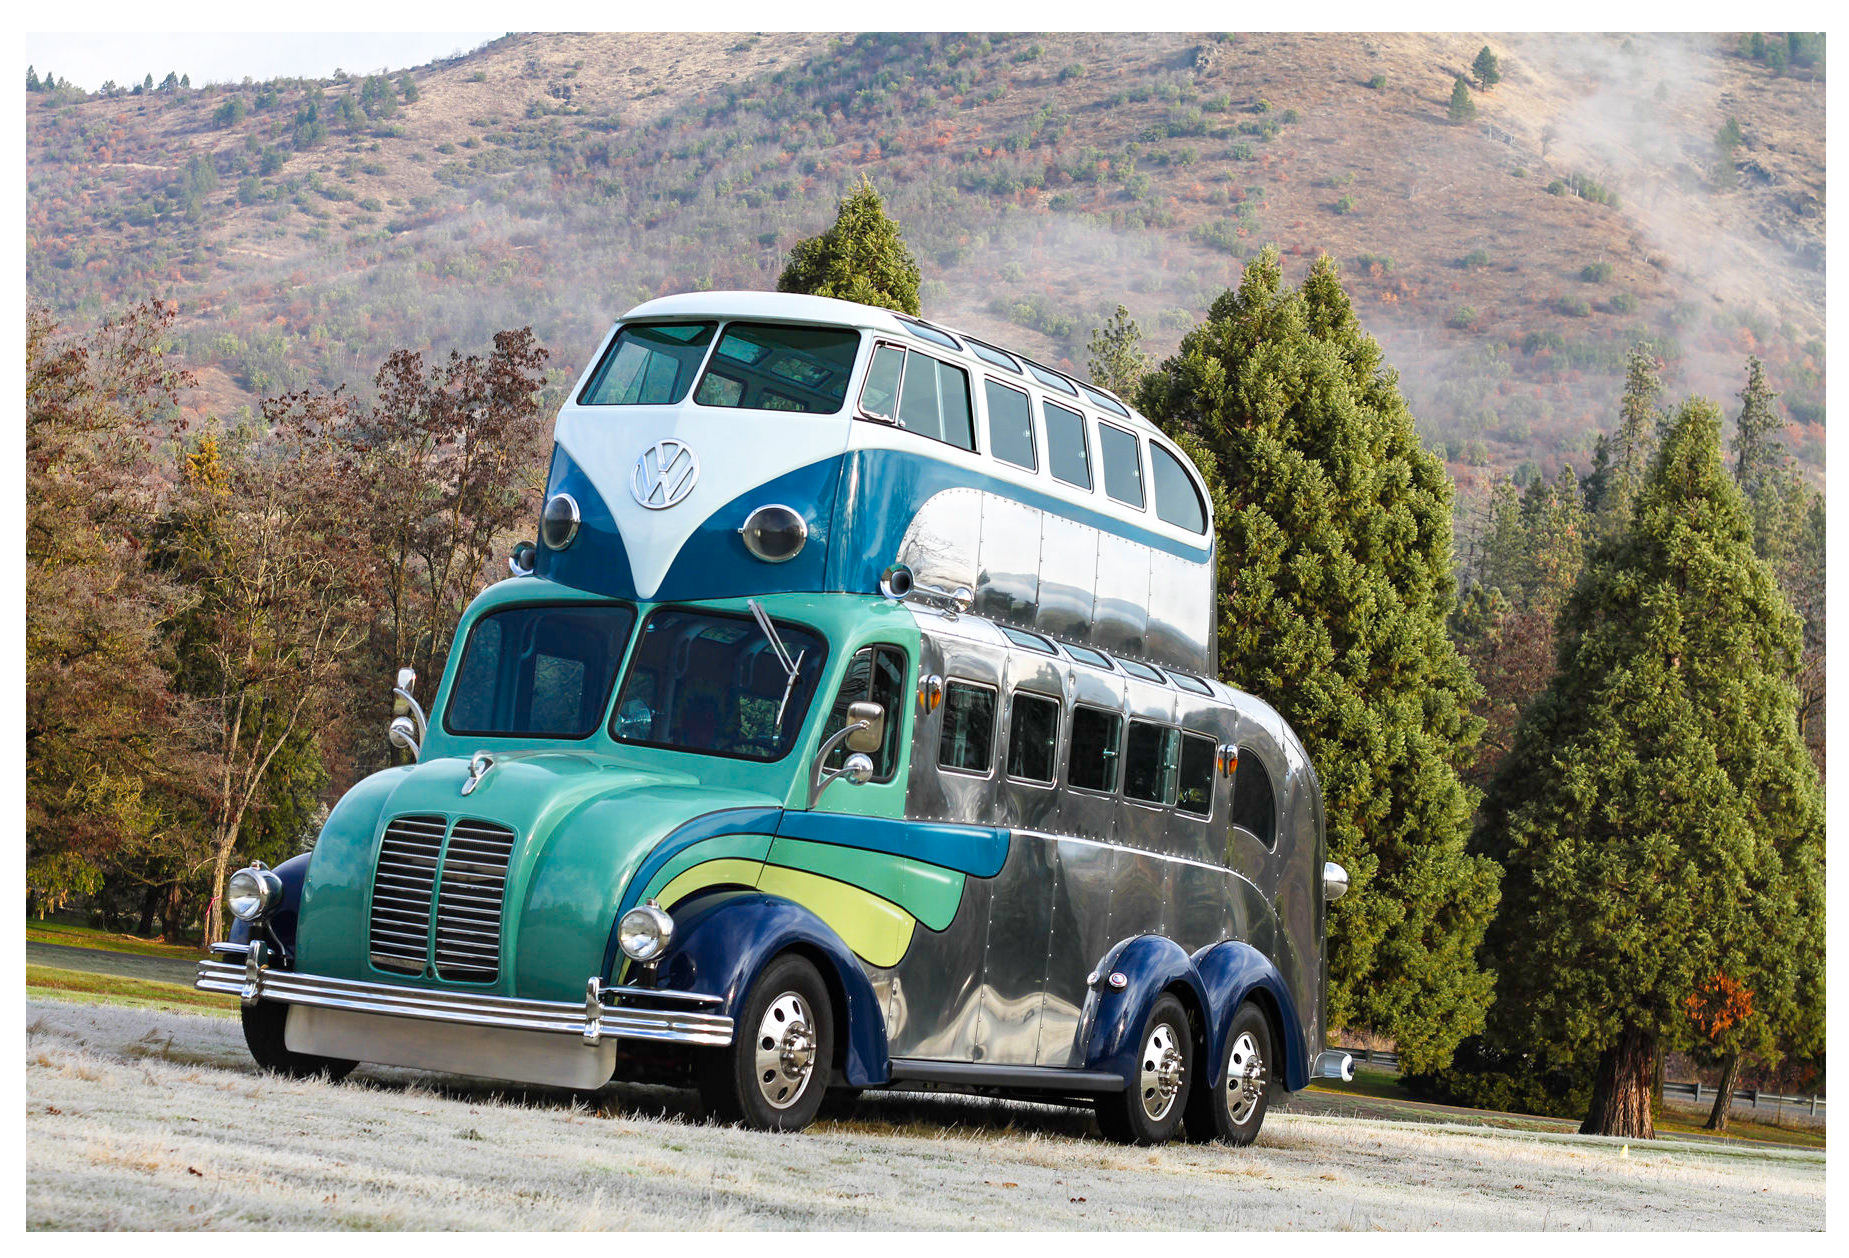 Randy Grubb S Latest Creation The Magic Bus